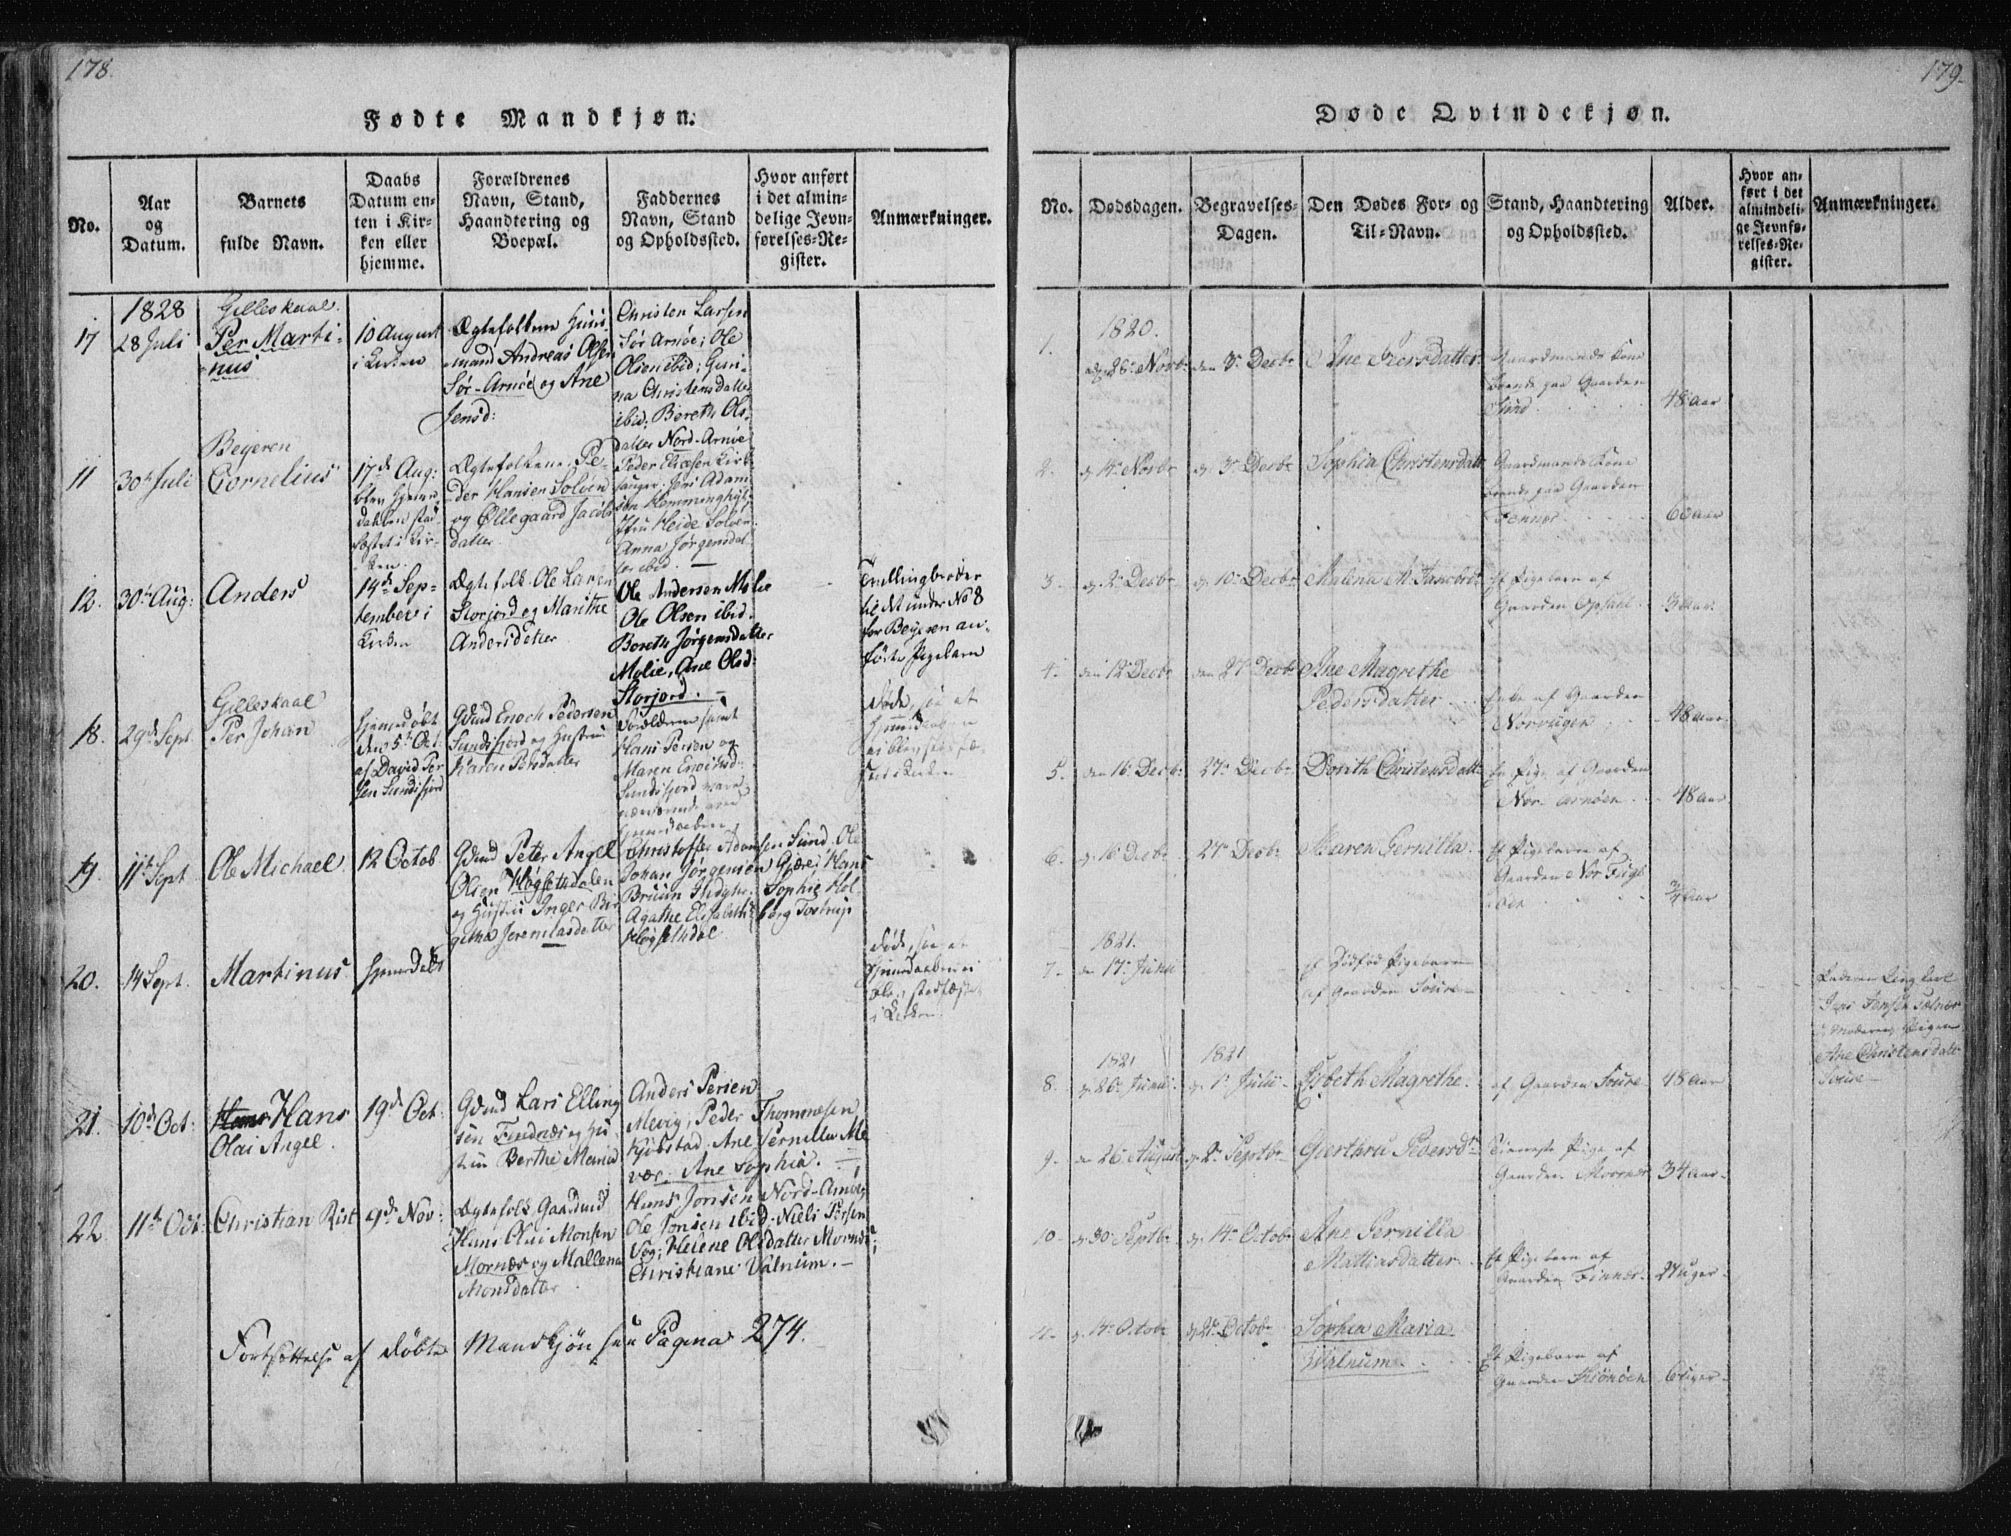 SAT, Ministerialprotokoller, klokkerbøker og fødselsregistre - Nordland, 805/L0096: Ministerialbok nr. 805A03, 1820-1837, s. 178-179